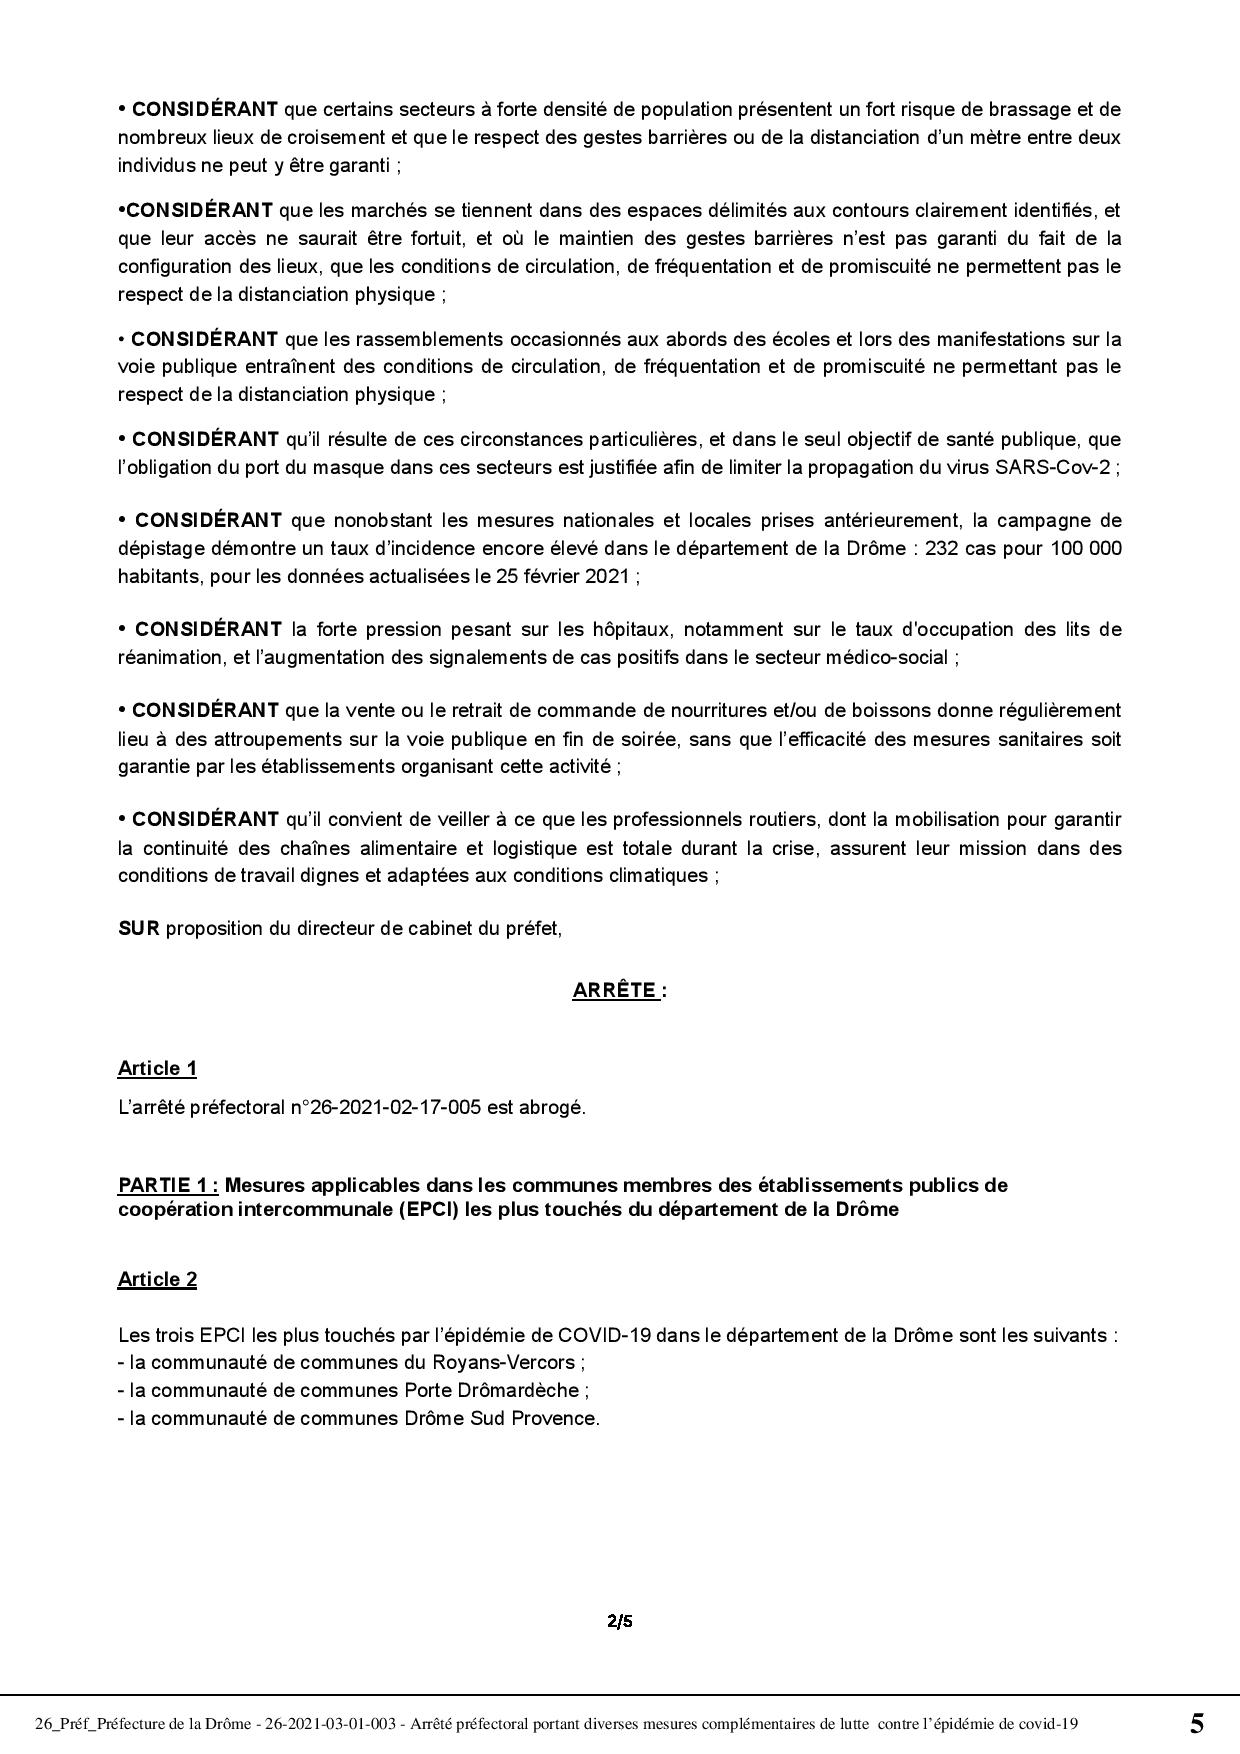 recueil-26-2021-043-recueil-des-actes-administratifs-special_1_-2-page-005.jpg